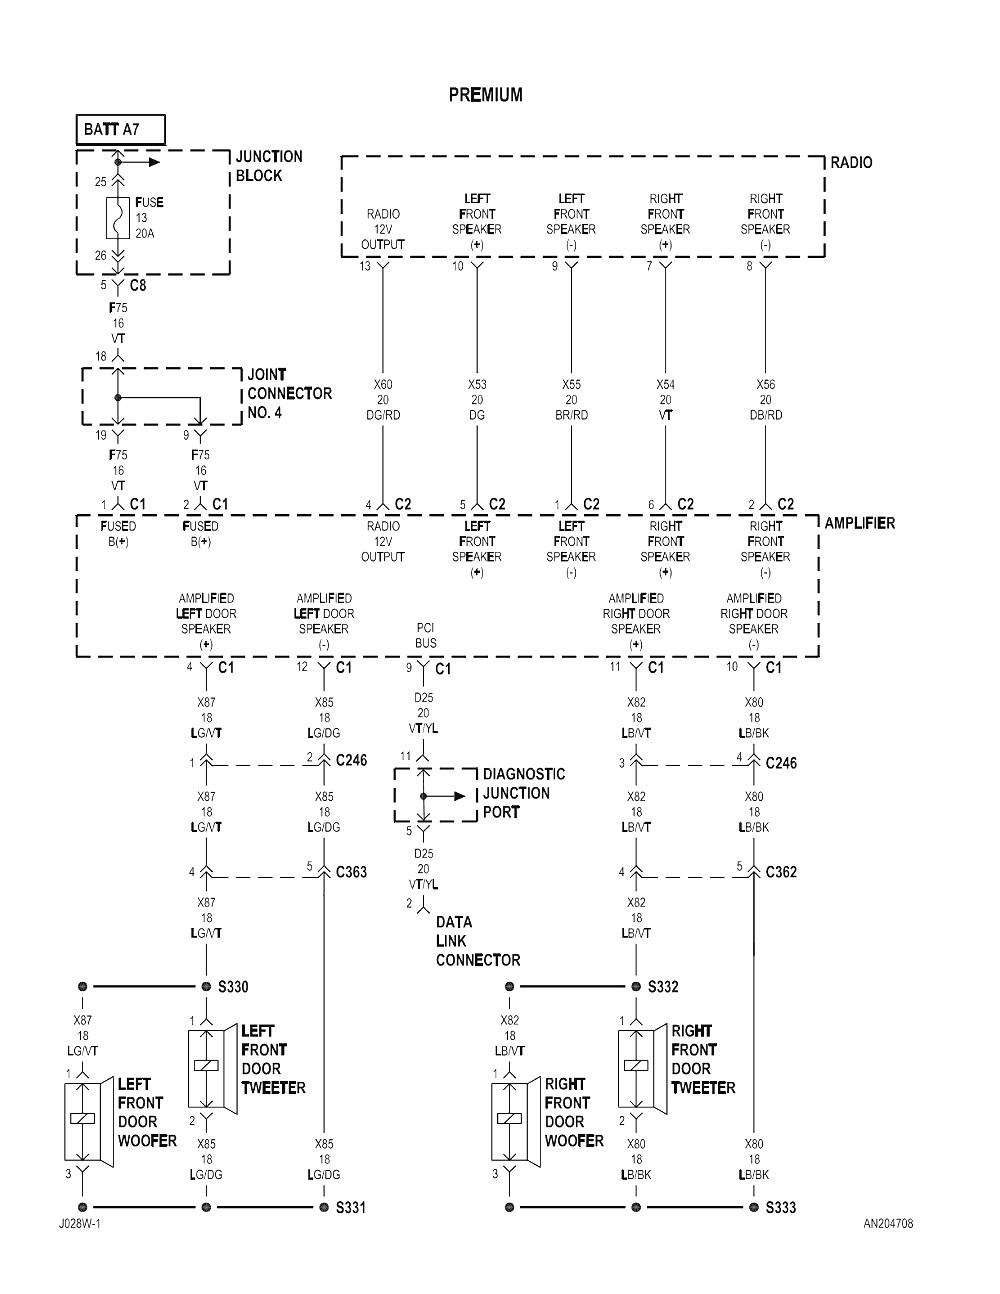 1997 dodge dakota radio wiring diagram Collection-001 Dodge Dakota Stereo Wiring Diagram Stylesync Me In 00 Radio 16-g